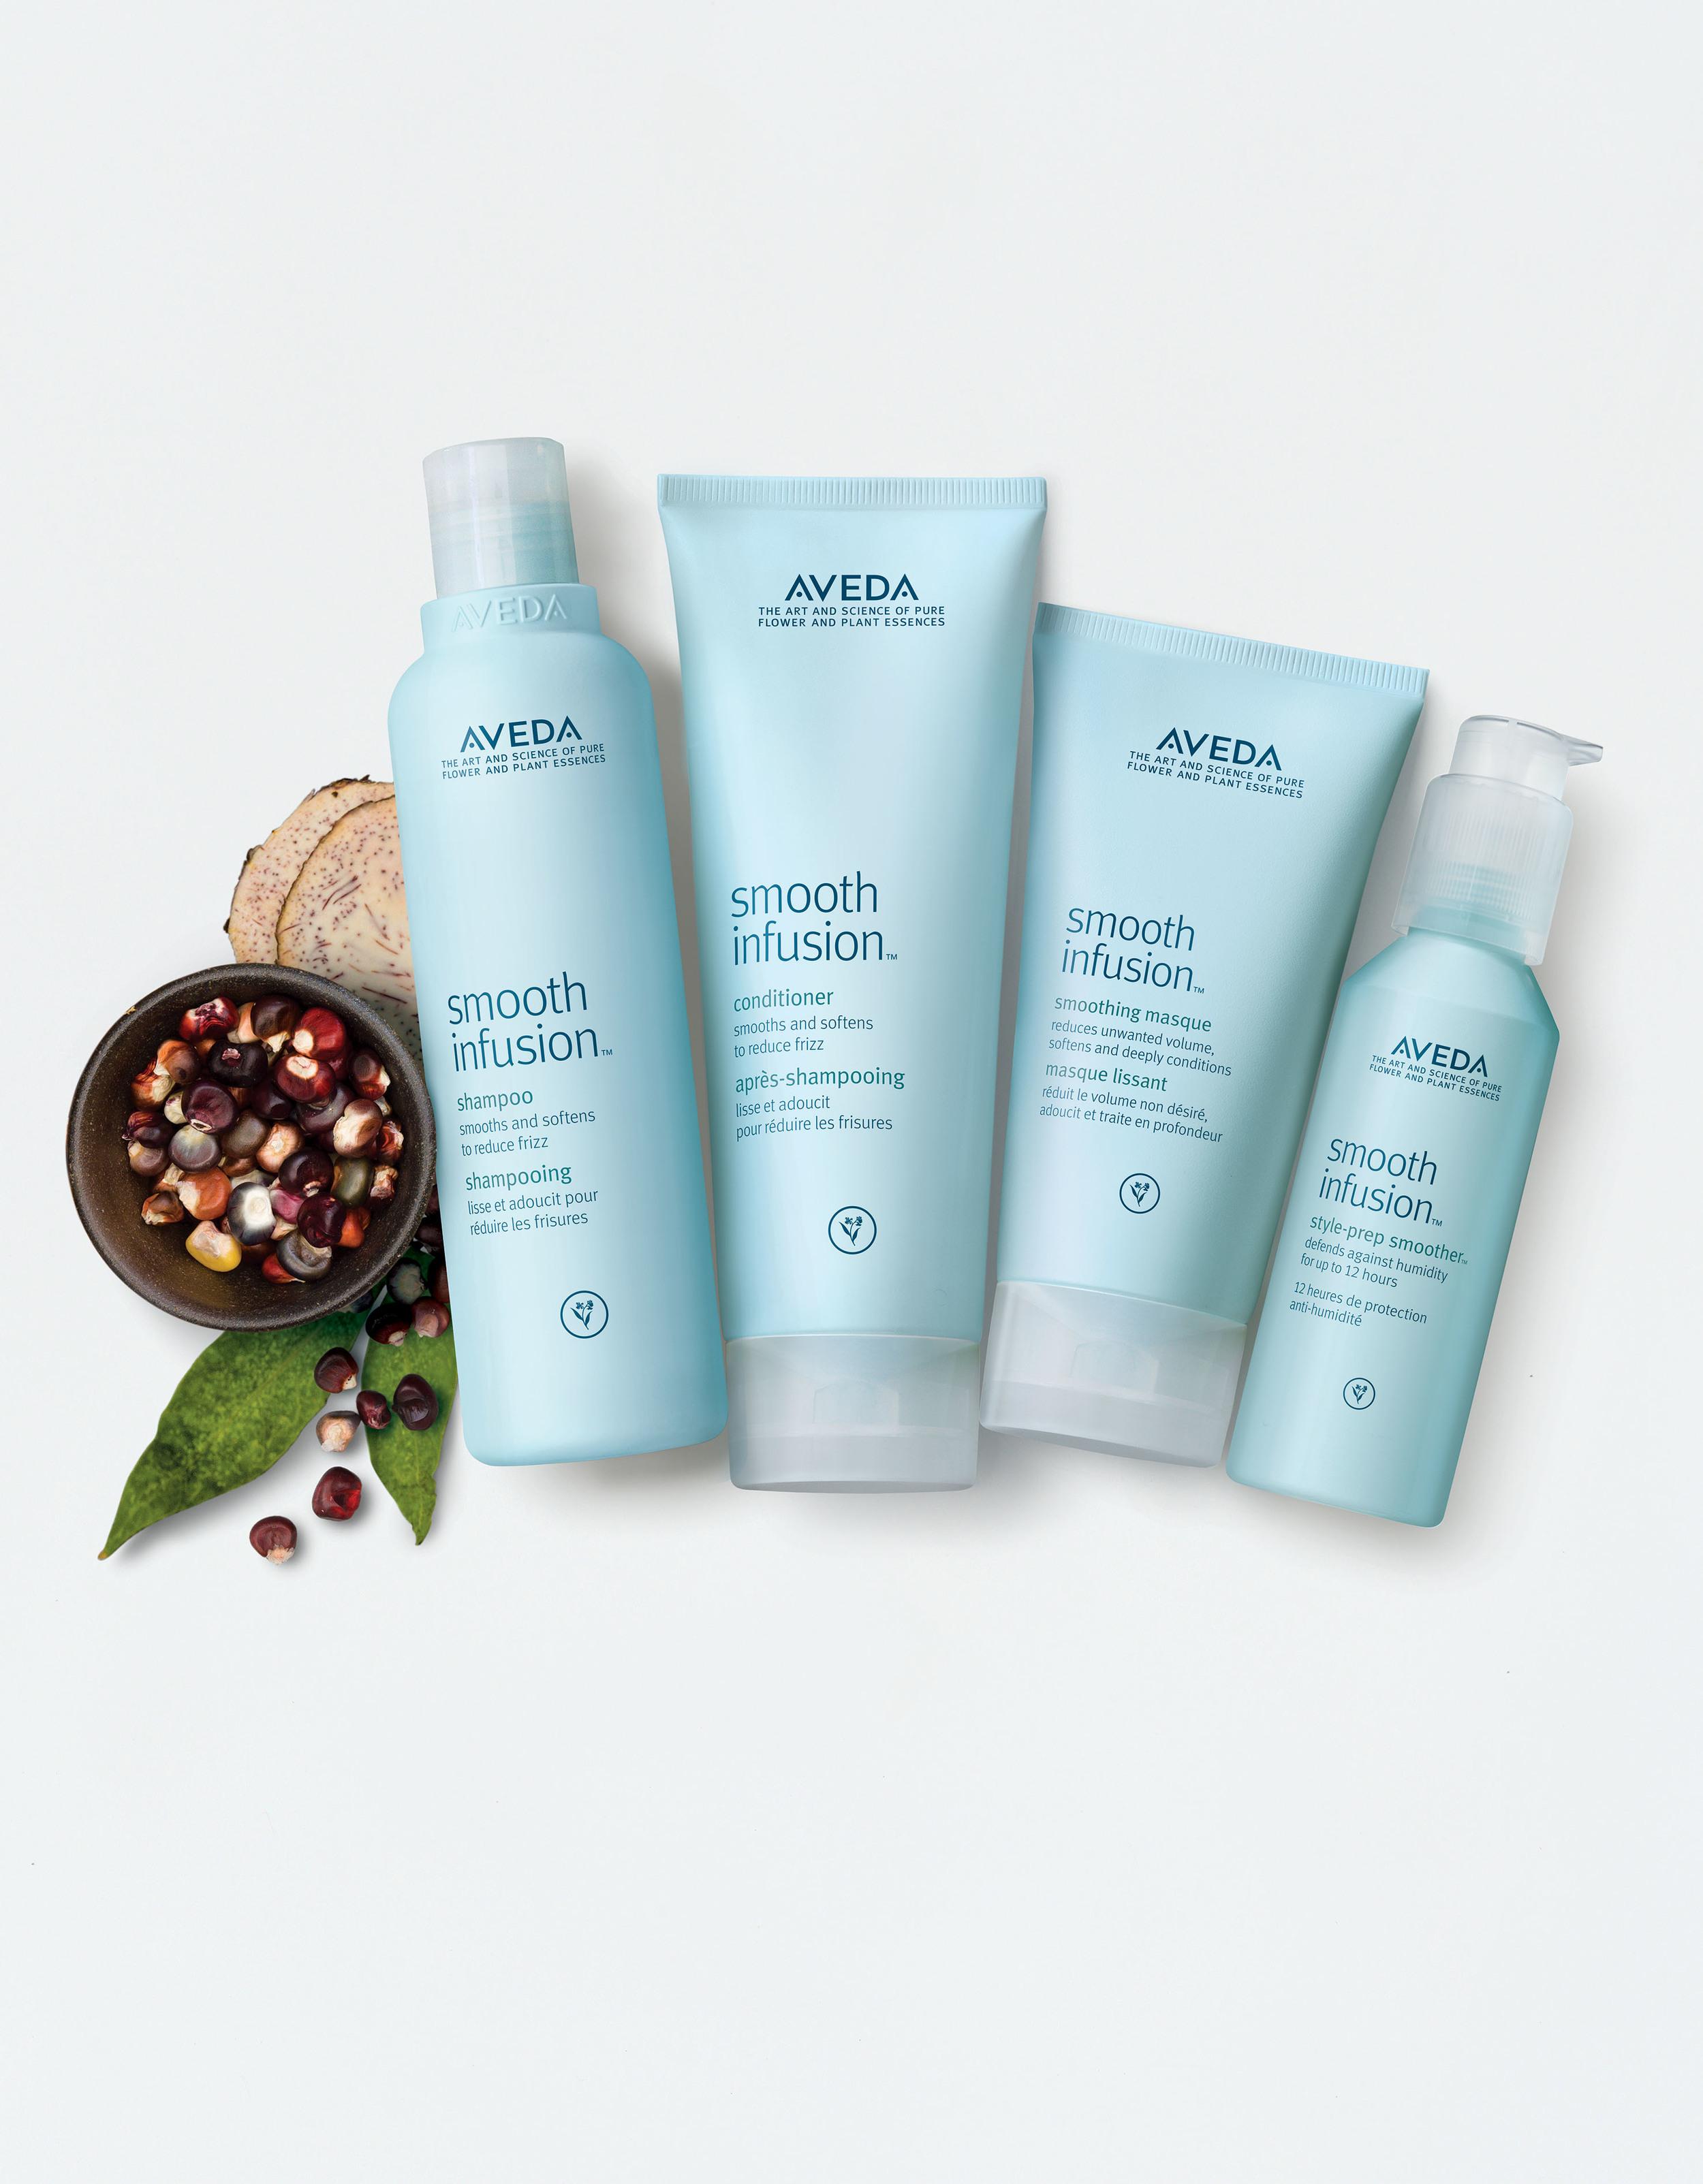 Nurture hair with smoothing formulasof botanical nourishment, including the NEW smoothing masque.